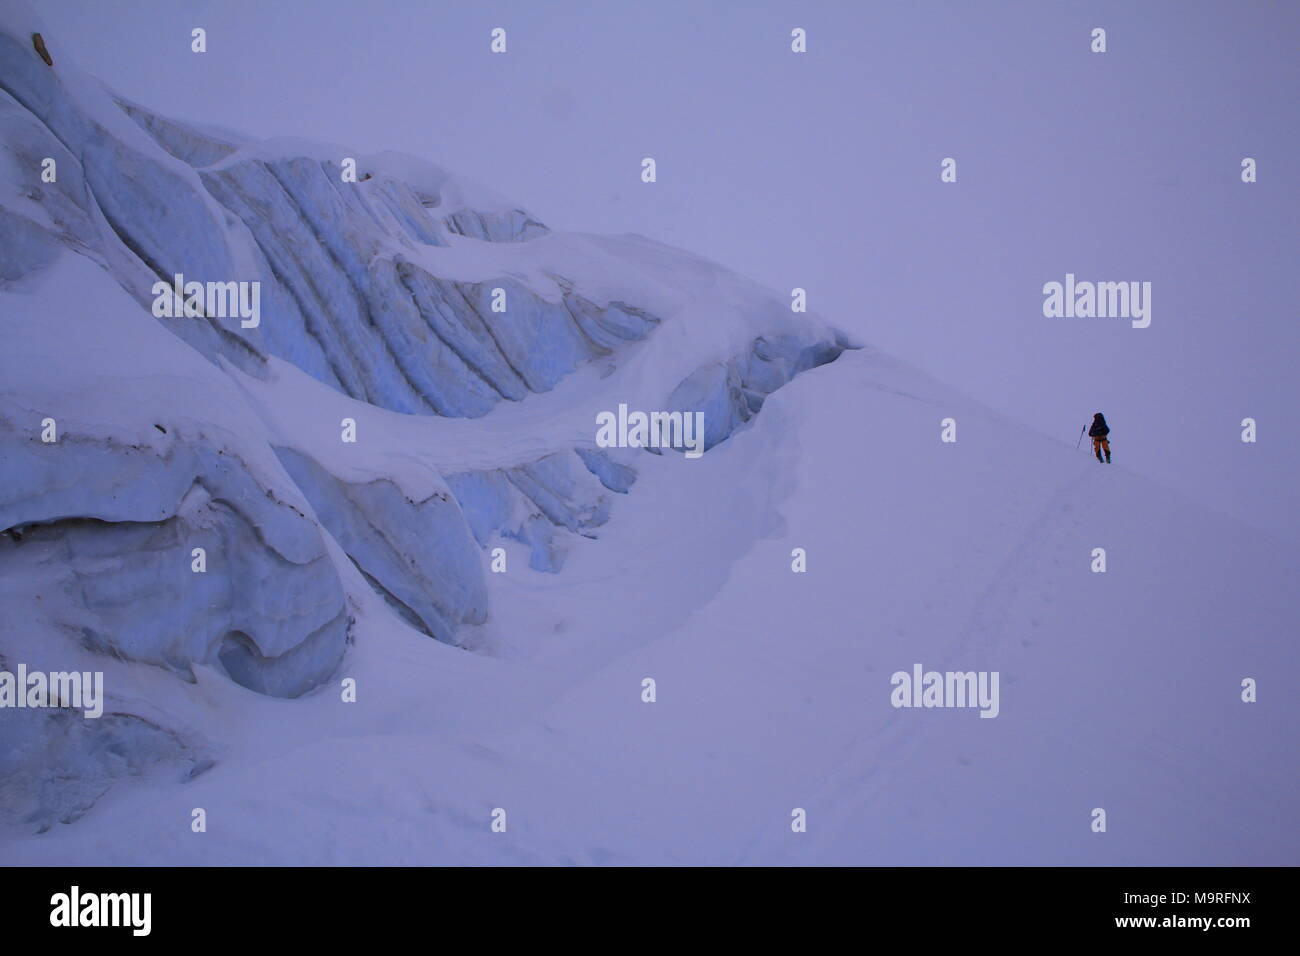 Eisfall auf dem Gletscher Stockbild